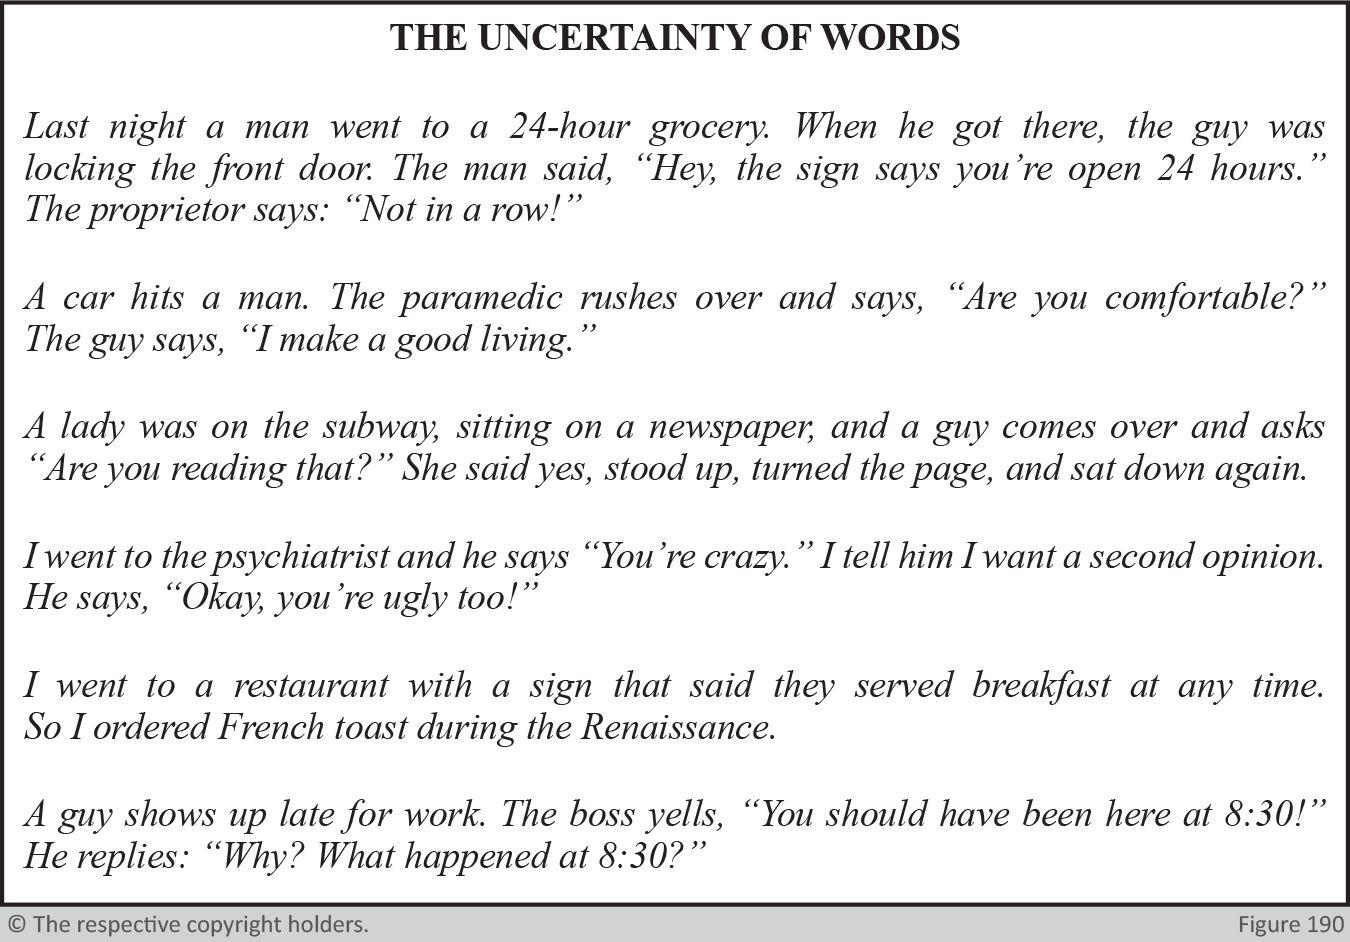 Uncertainty of Words